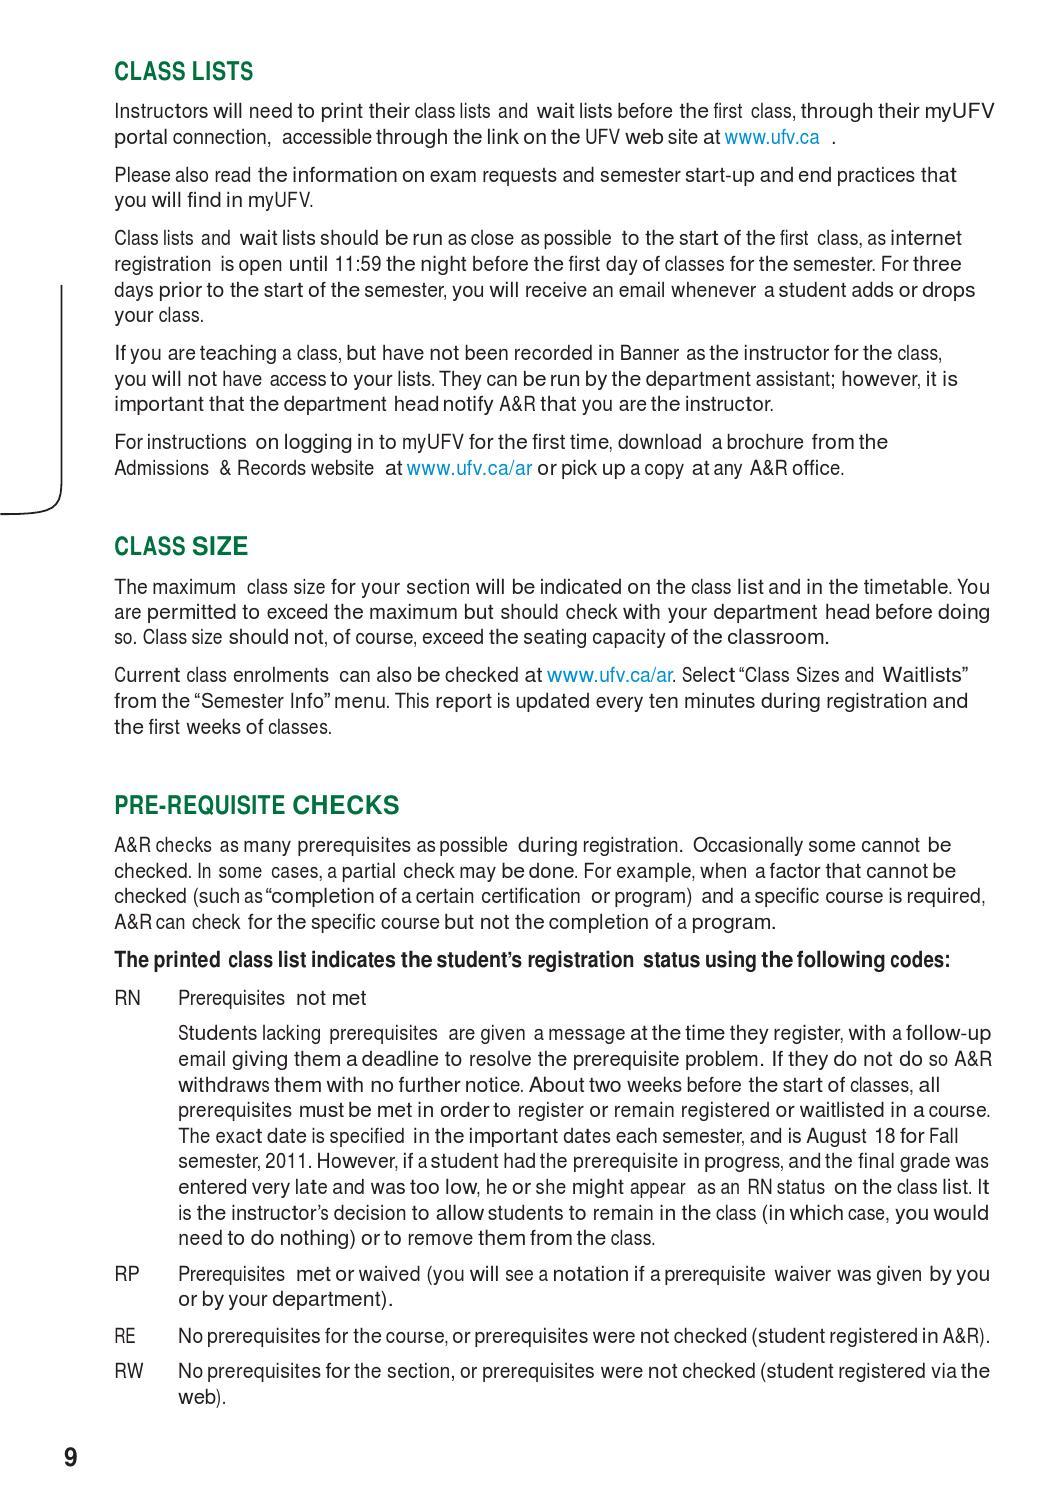 myufv FACULTY HANDBOOK 2012-2013 by University of the Fraser Valley - issuu